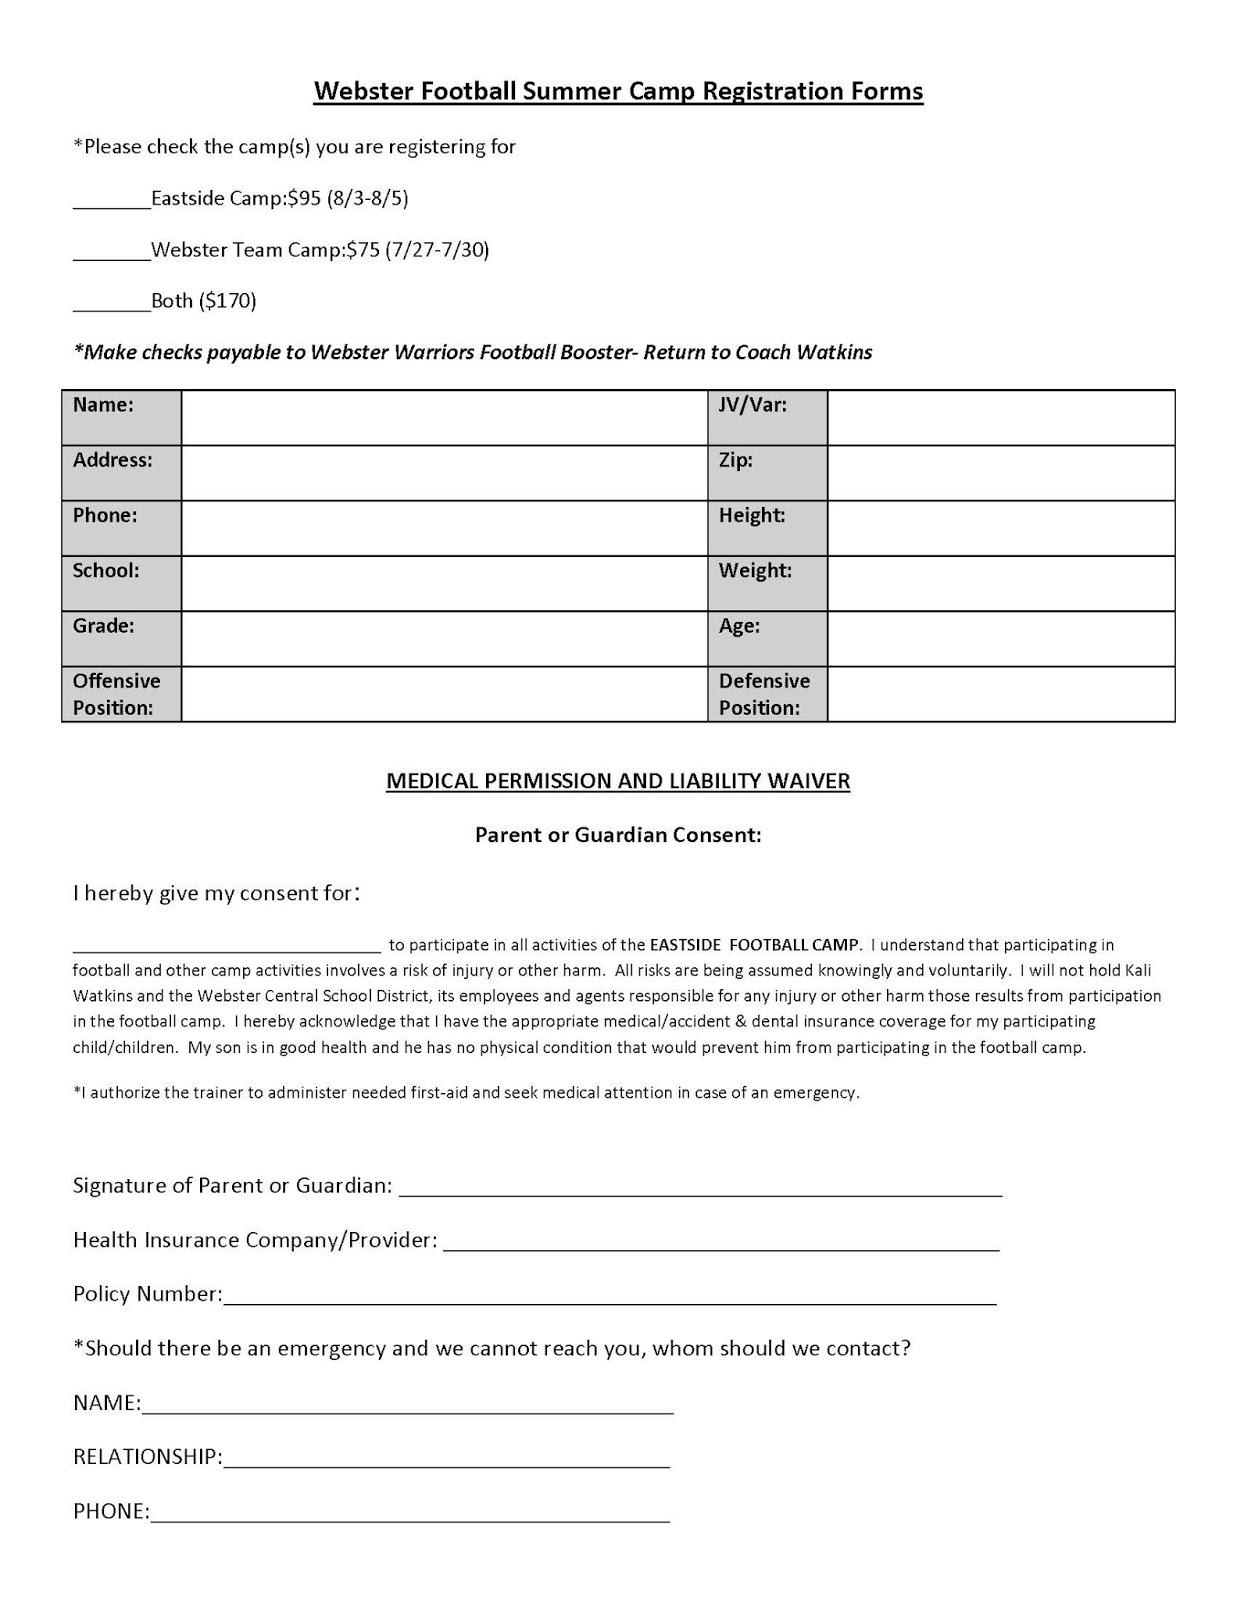 blank registration form template